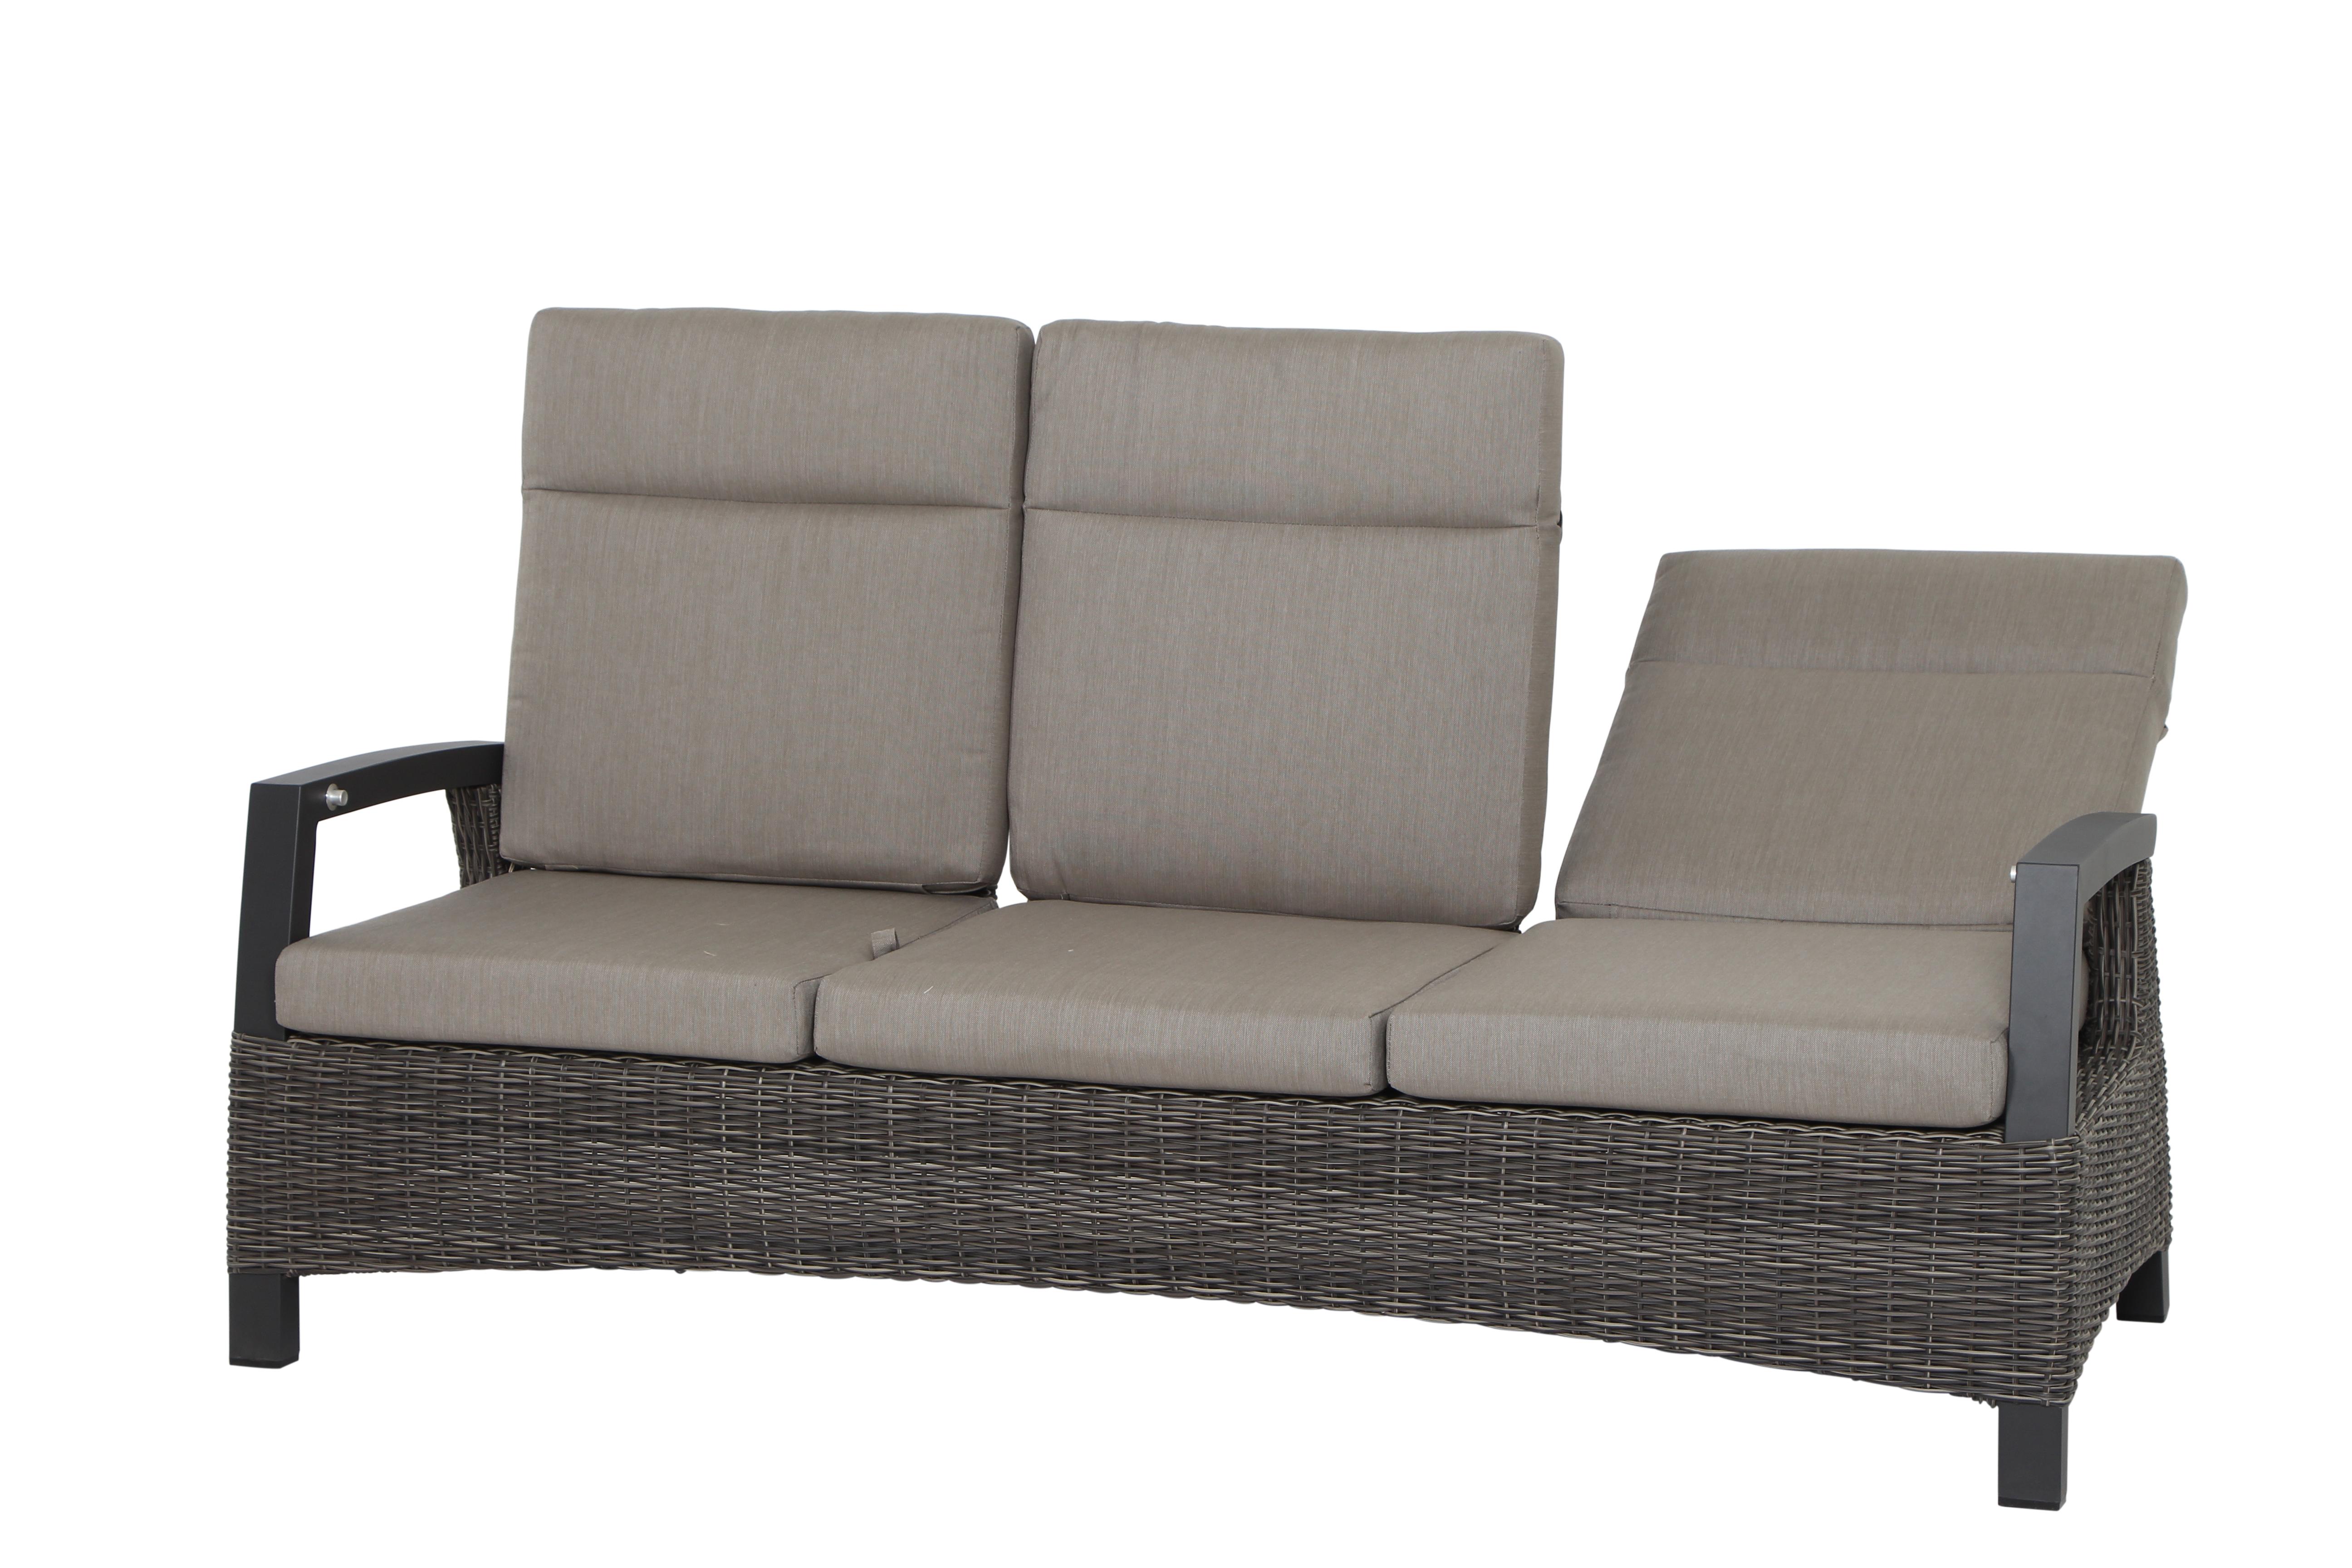 CORIDO 3er Lounge Sofa